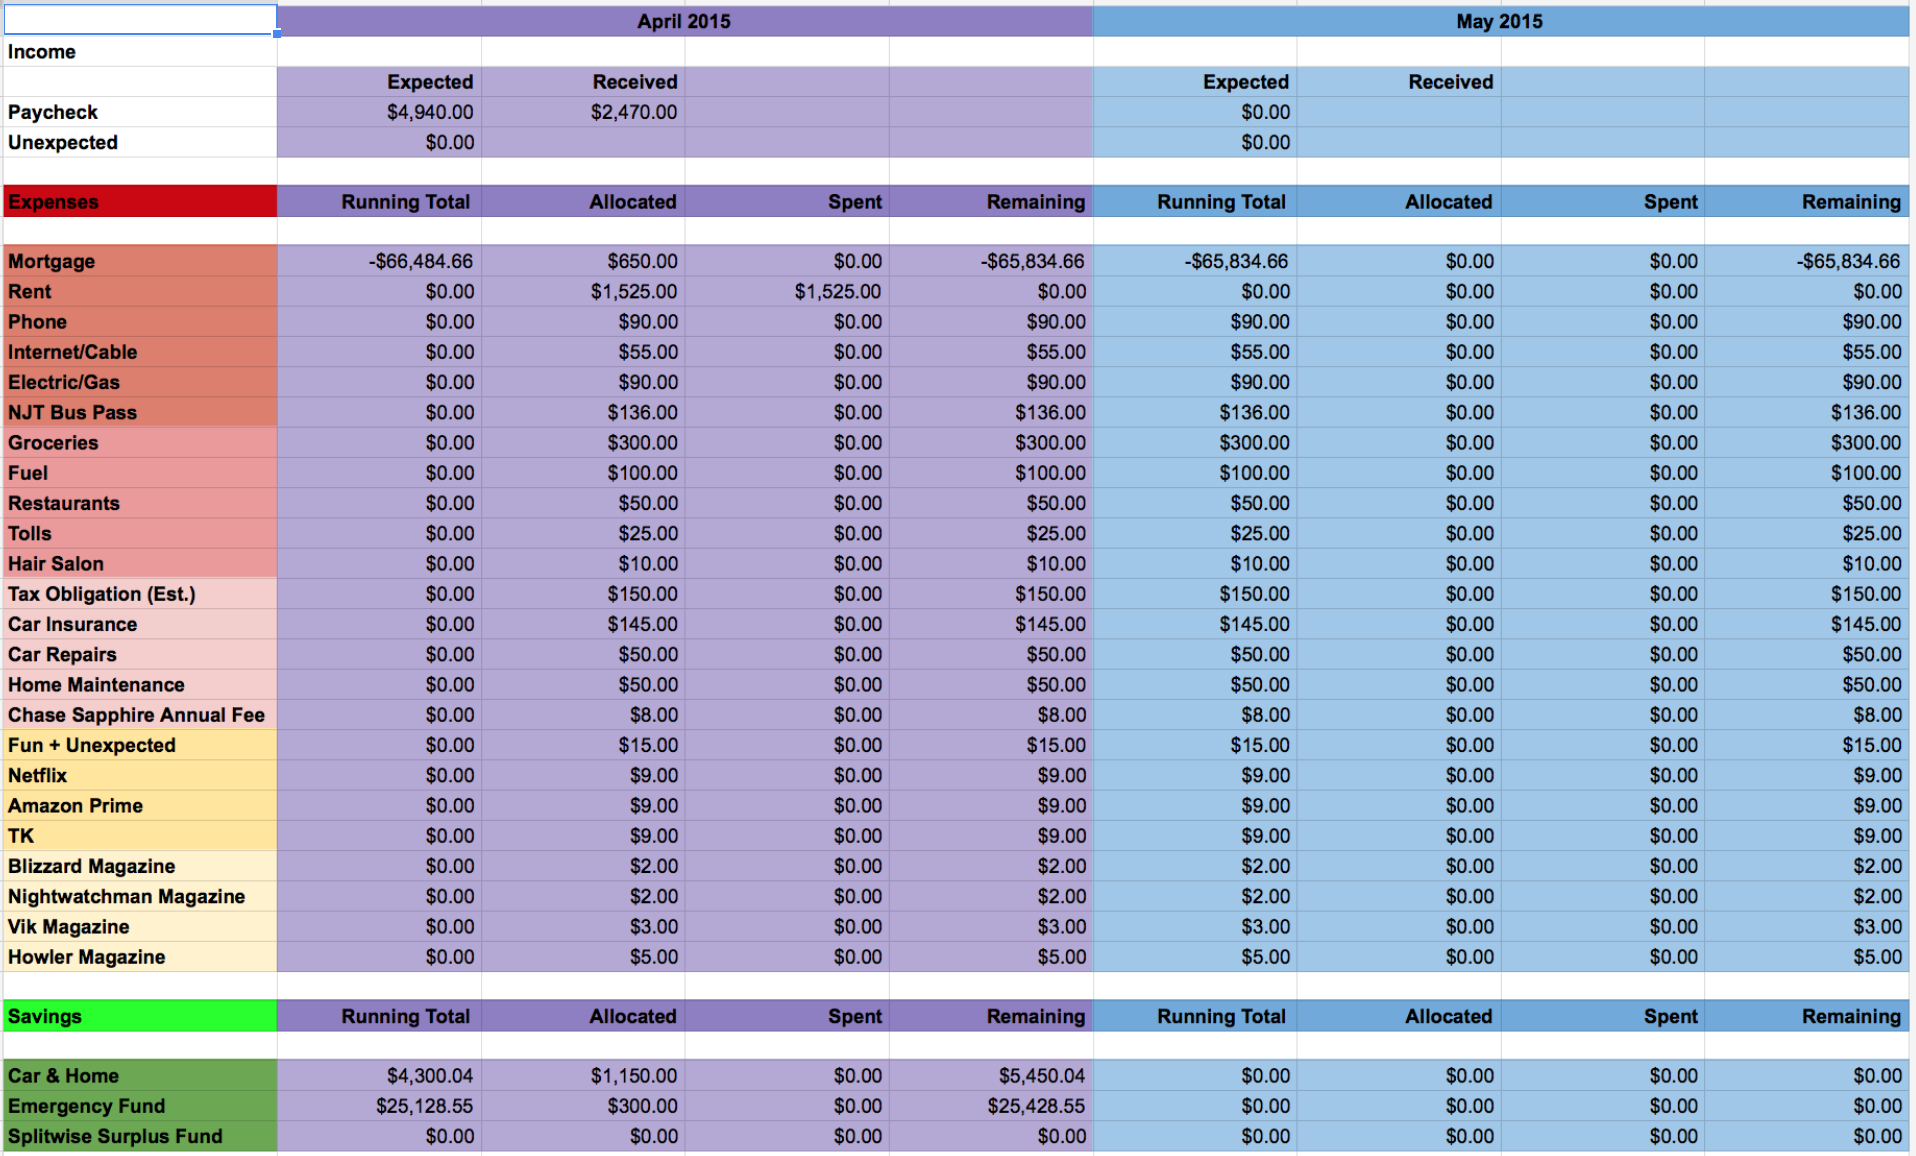 Ynab Spreadsheet Regarding Ynab In Excel : Personalfinance